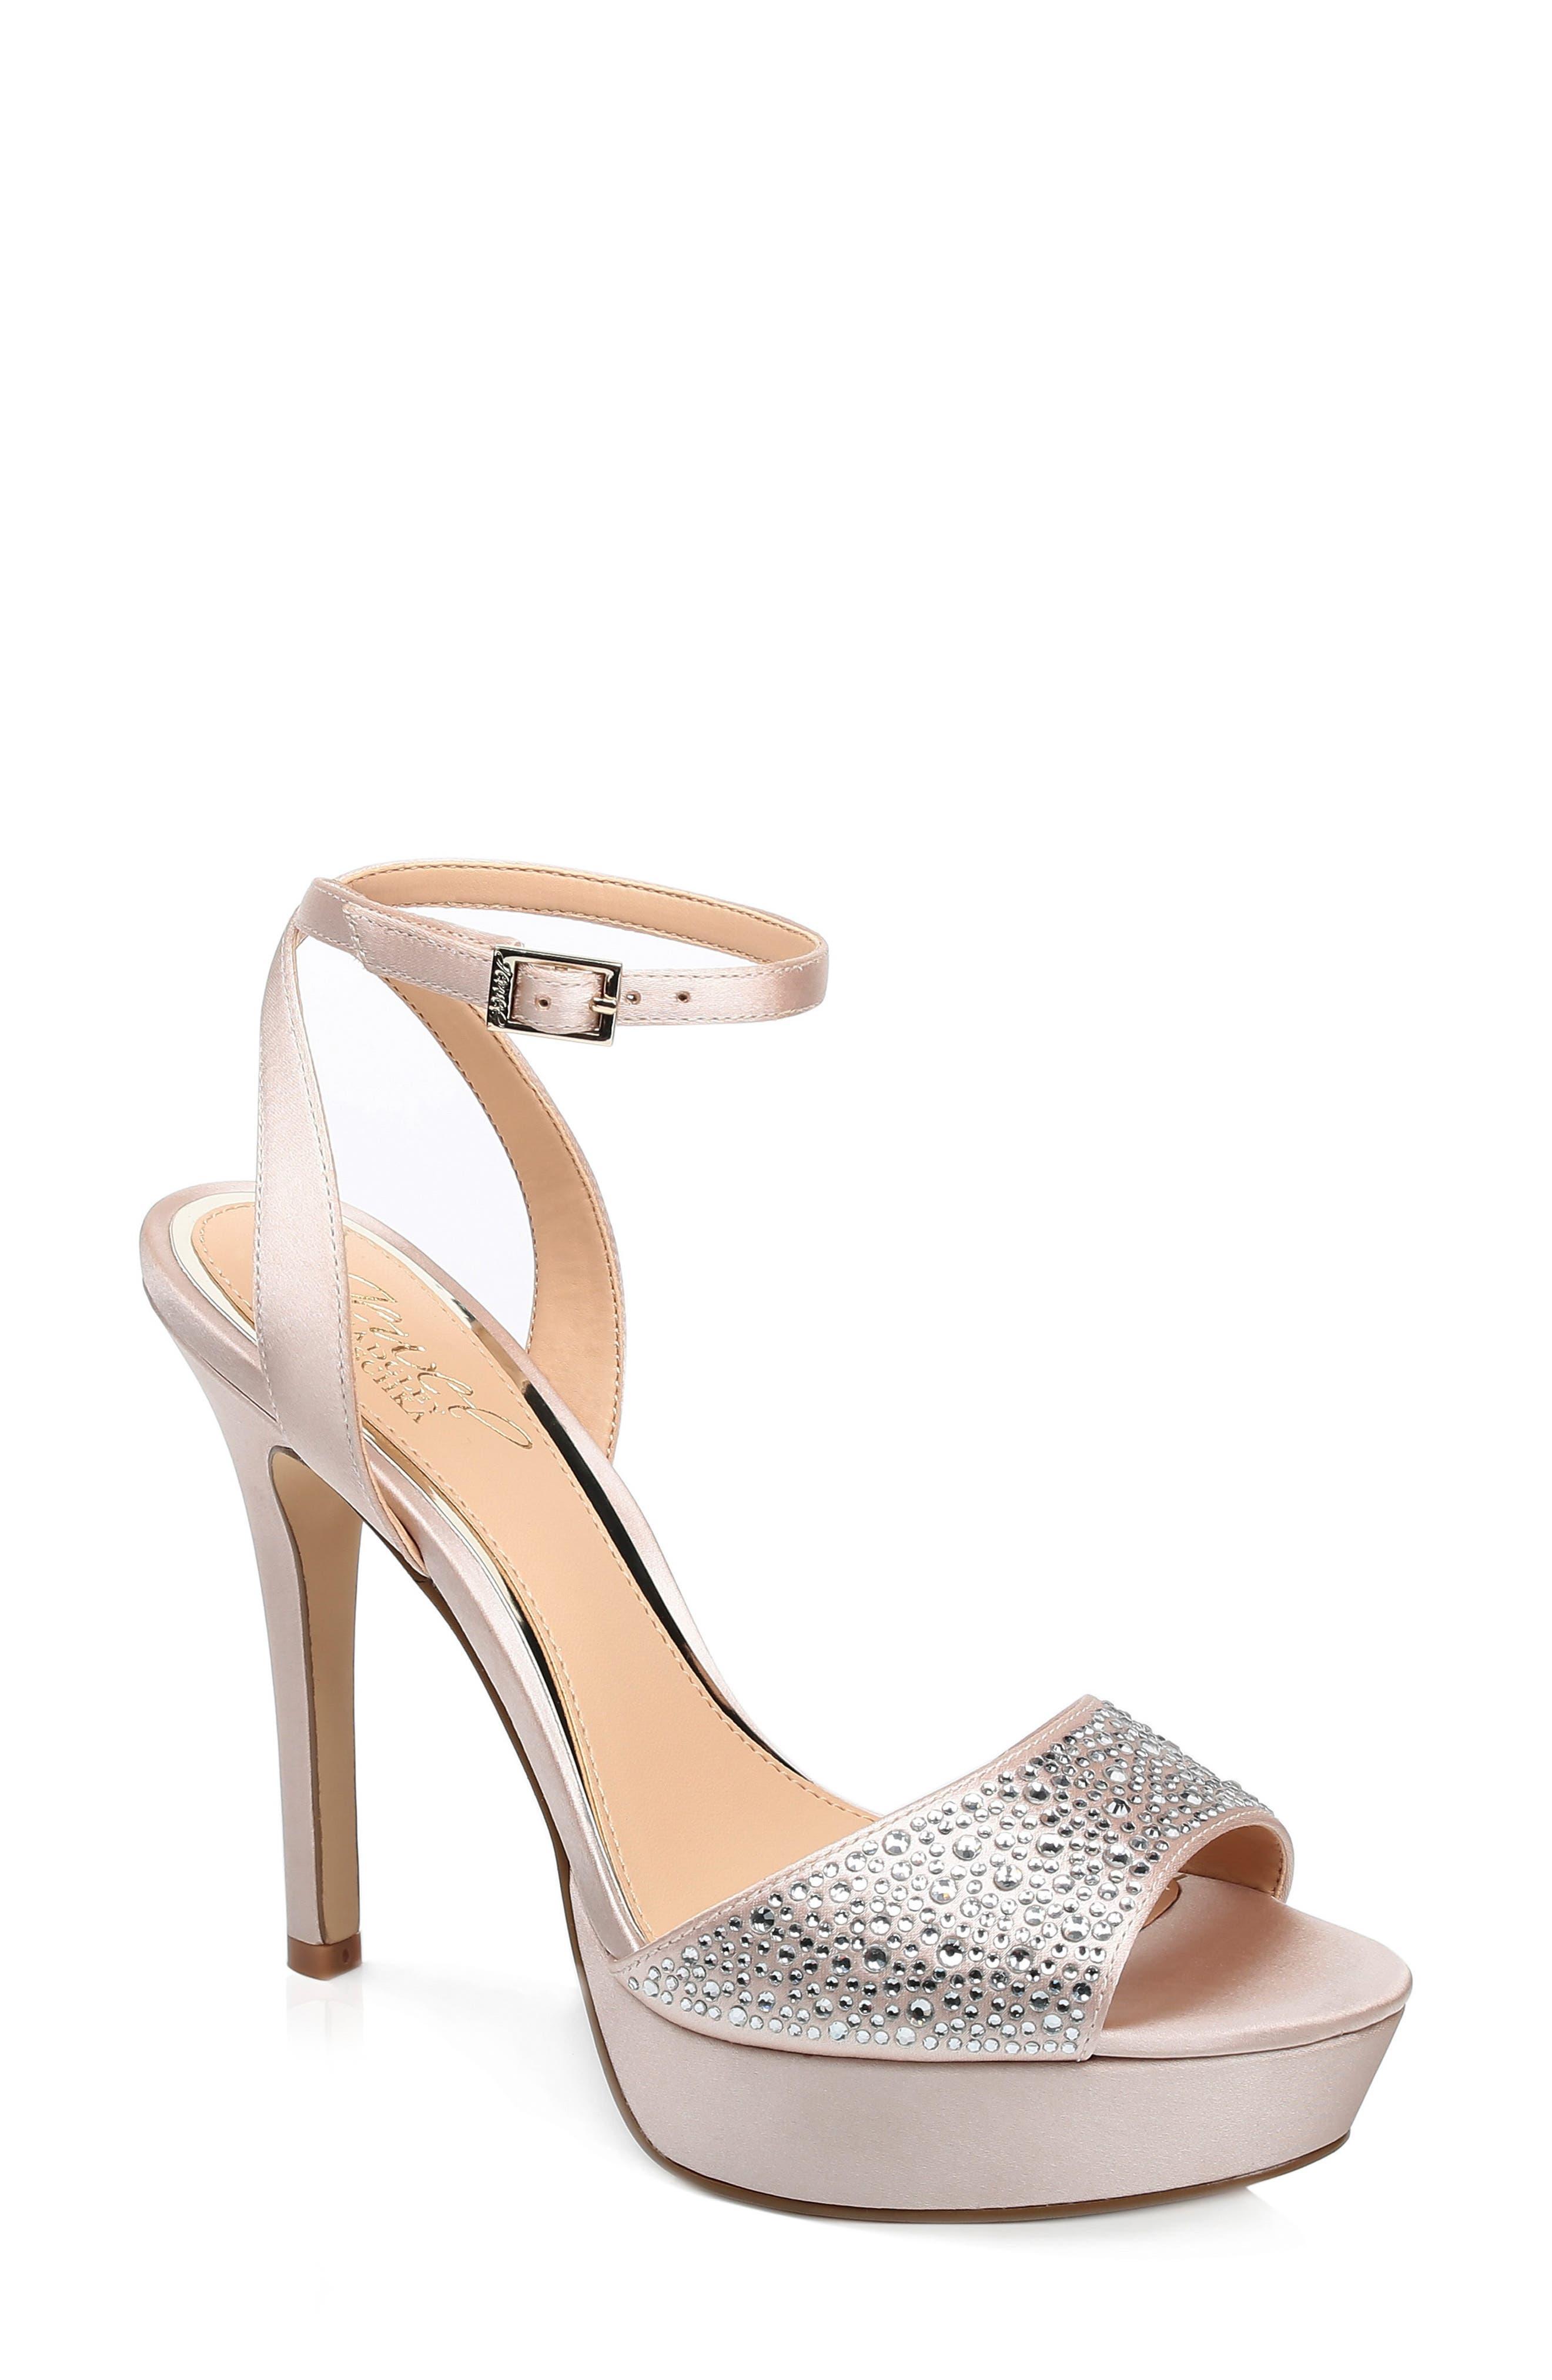 Jewel Badgley Mischka Milena Platform Sandal- Ivory